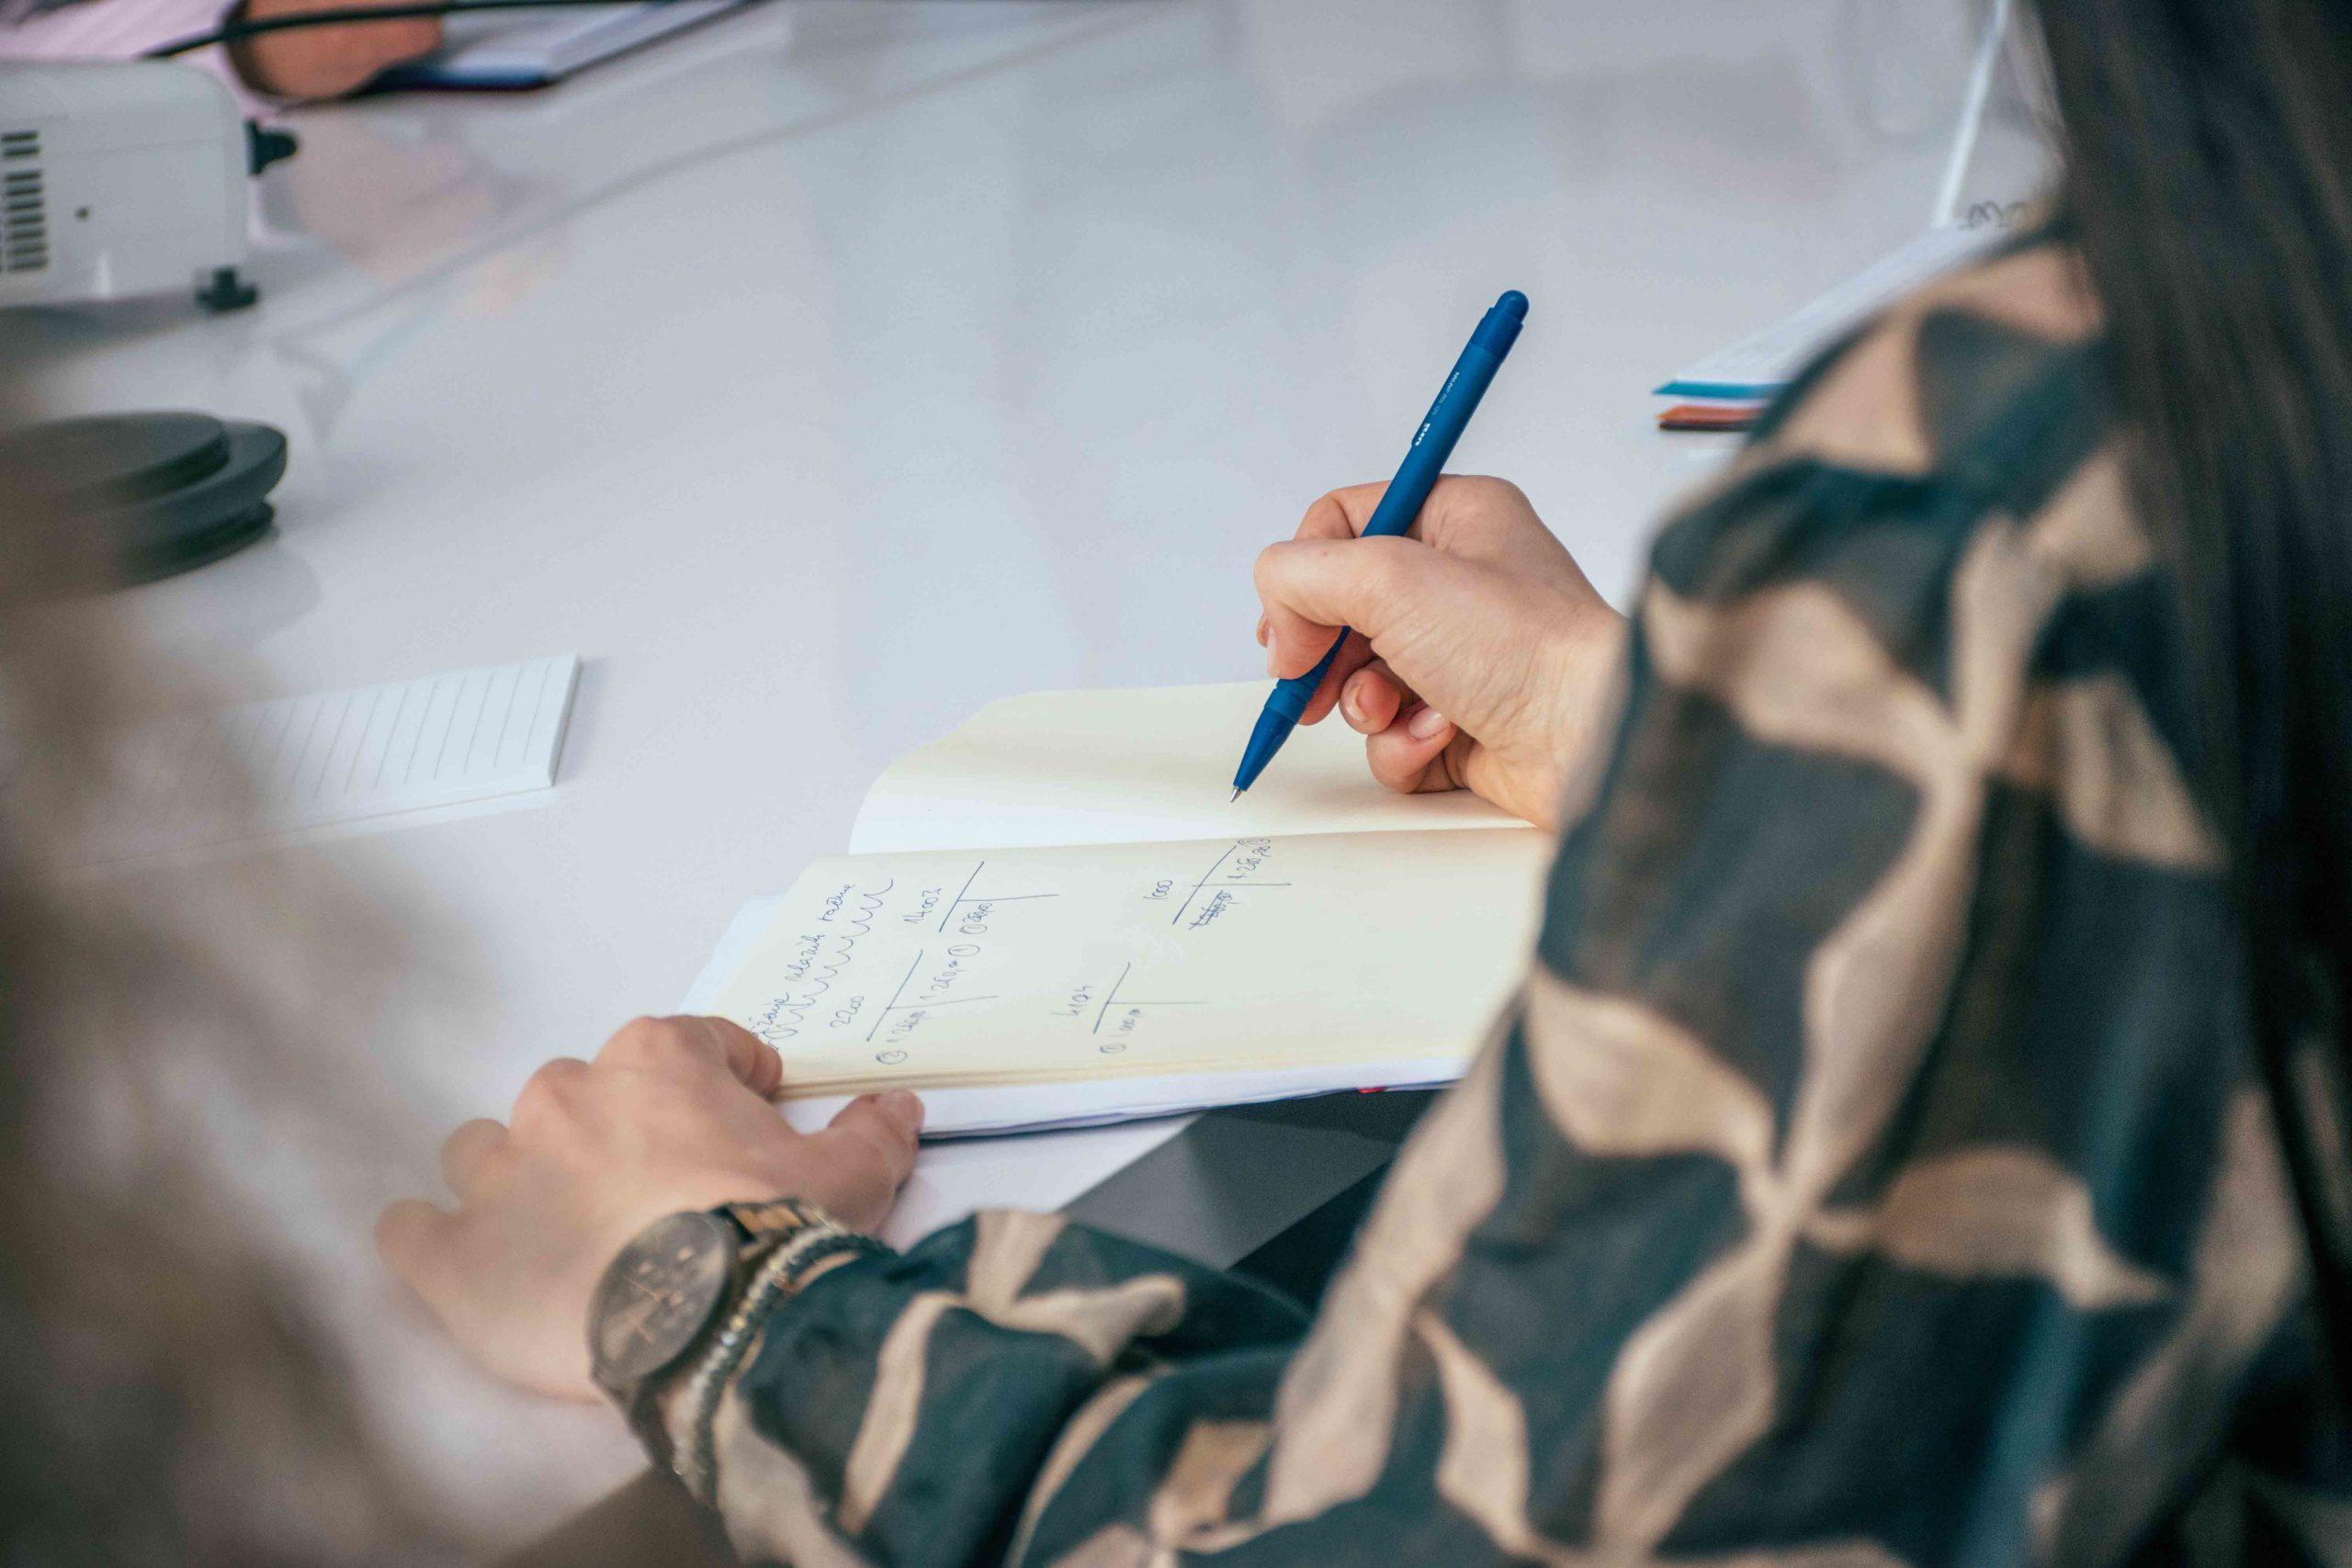 fiscalis uspješno poslovanje klijenata računovodstvo savjeti savjetovanje računovodstvene usluge knjigovodstvo zagreb poslovanje bolji poslovni rezultati poslovanja